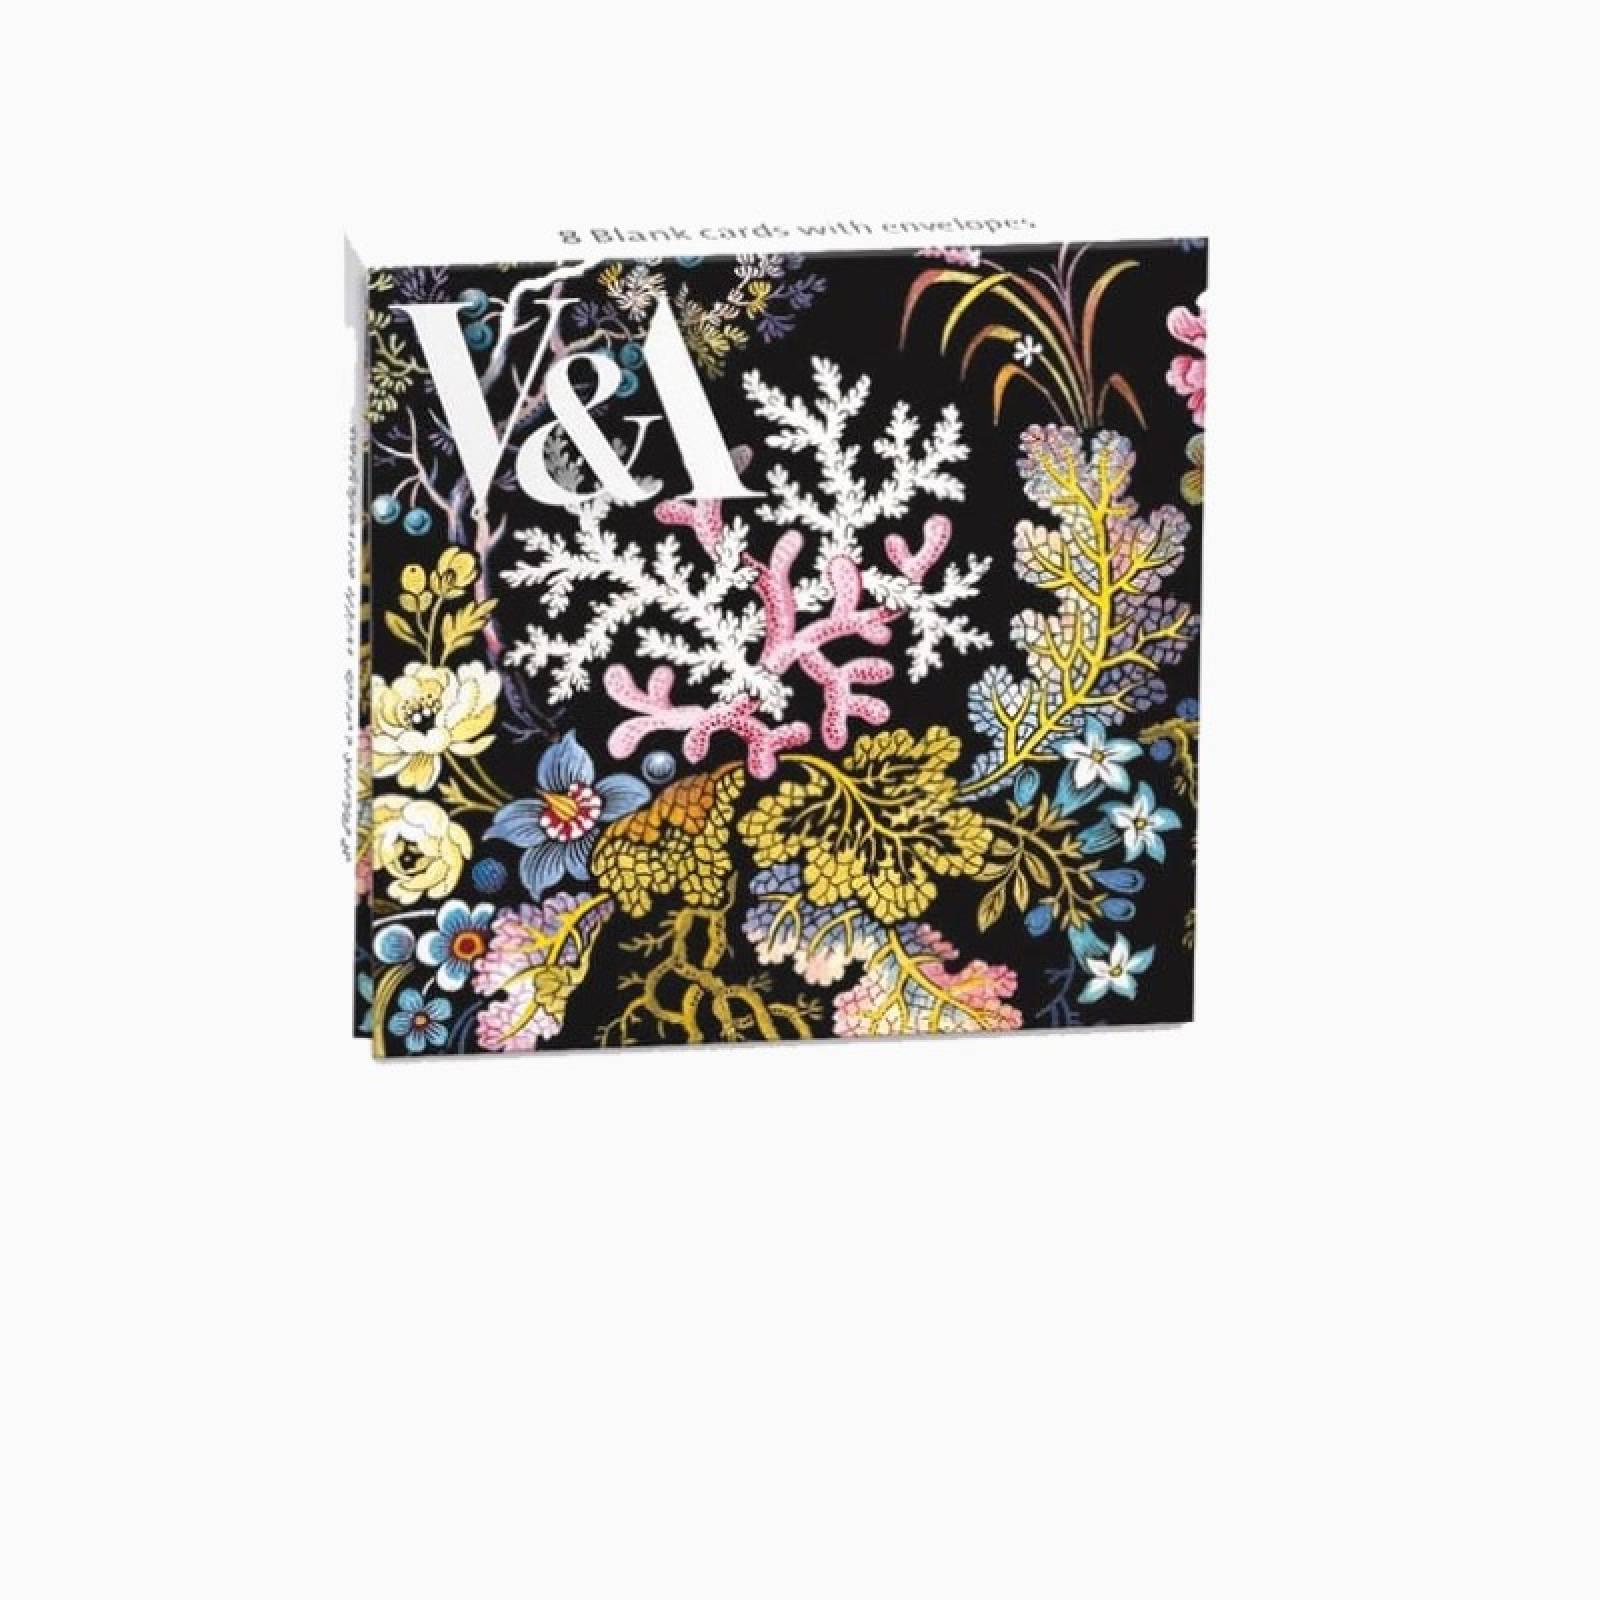 Kilburn Coral - Pack Of 8 Notecards And Envelopes